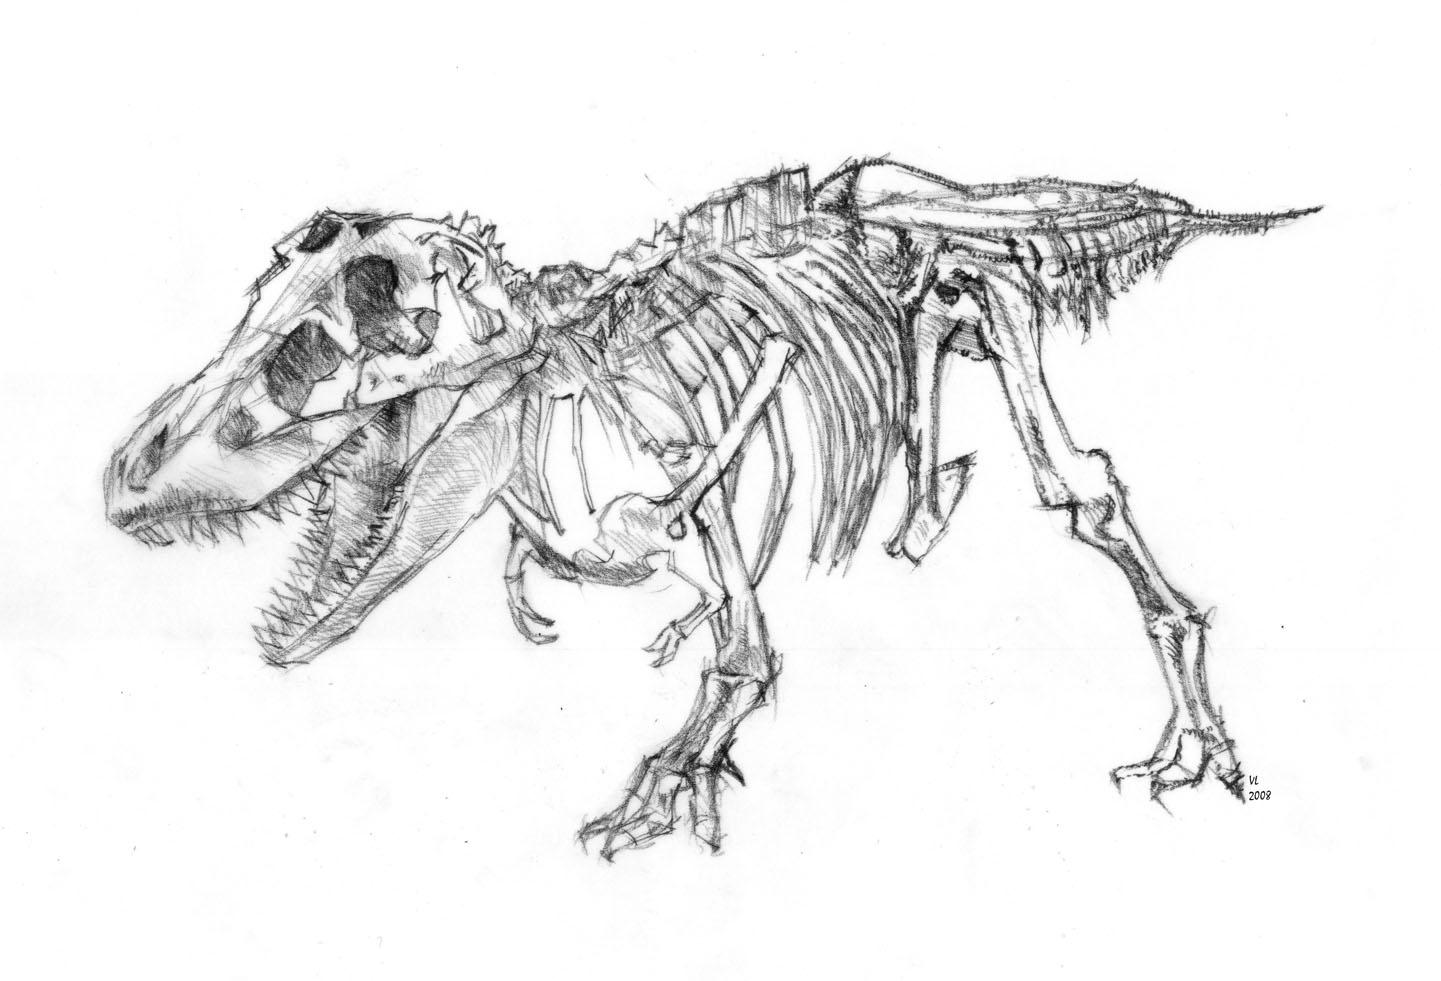 Jenghizkhan - Dessin de tyrannosaure ...